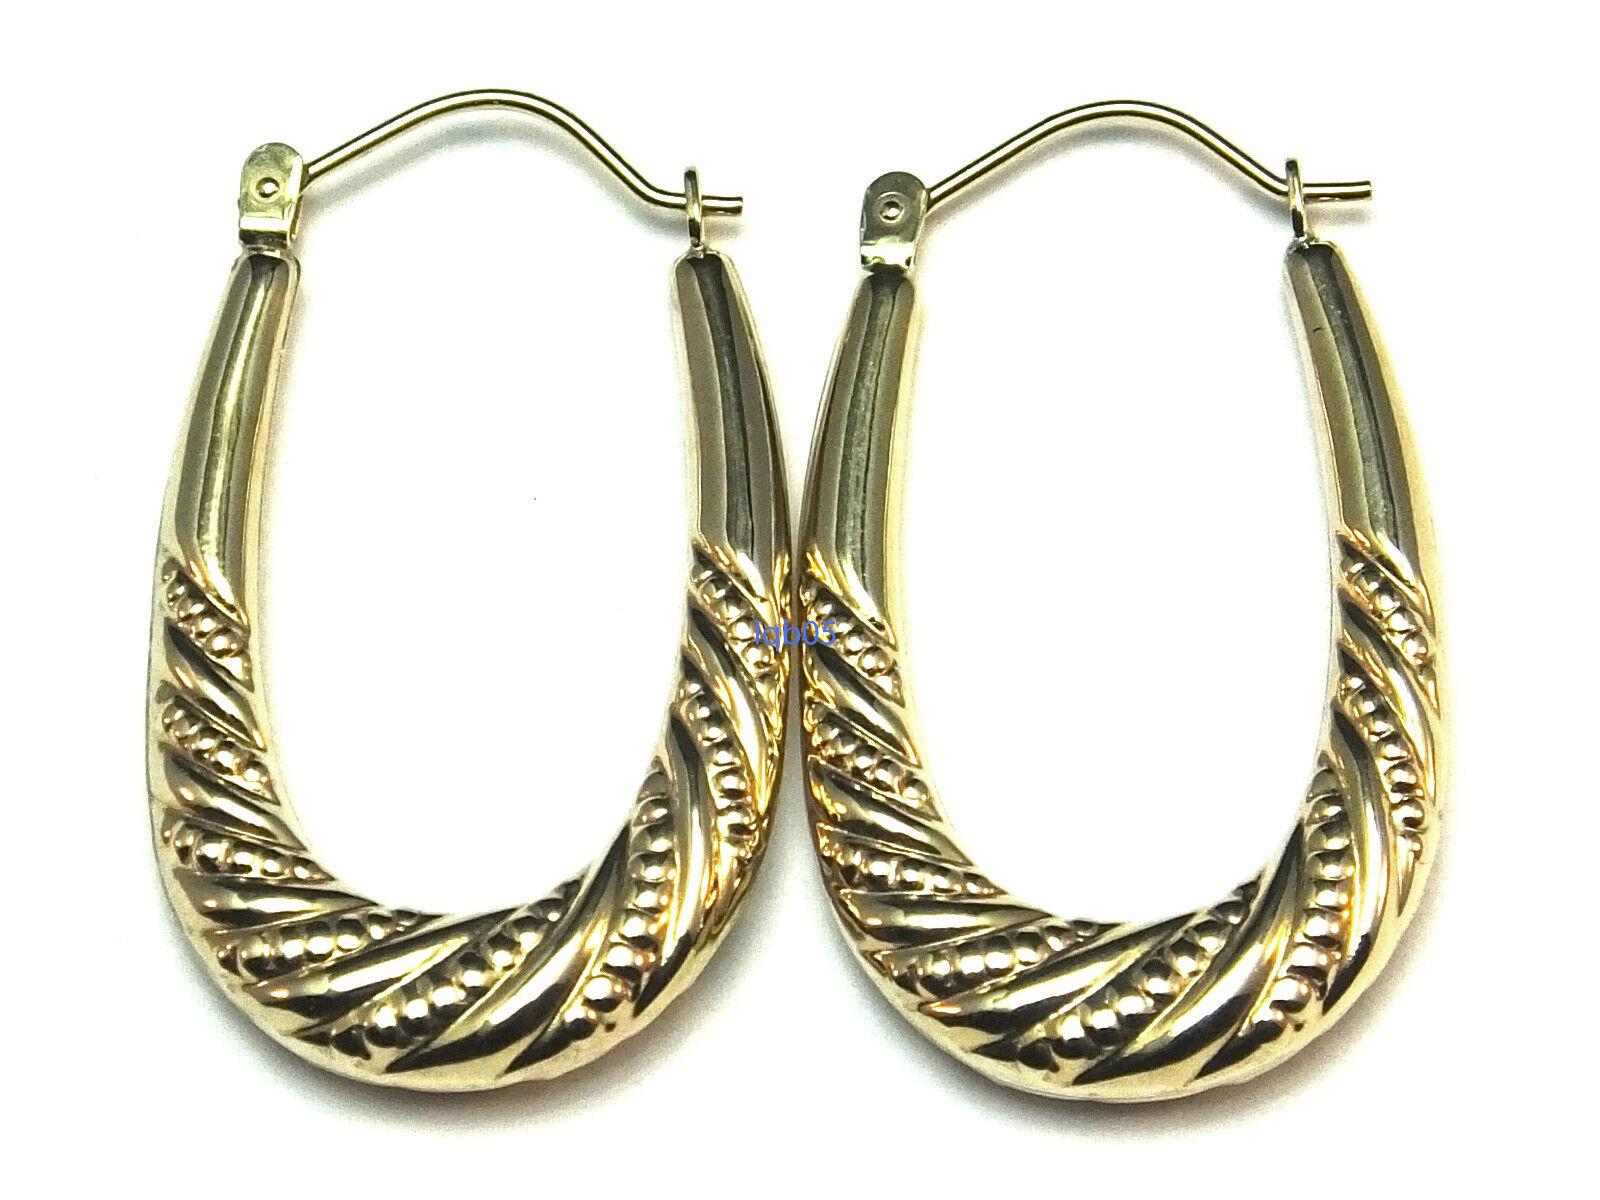 New Ladies 9ct Yellow gold Creoles Hoop Earrings 34mm Hallmarked